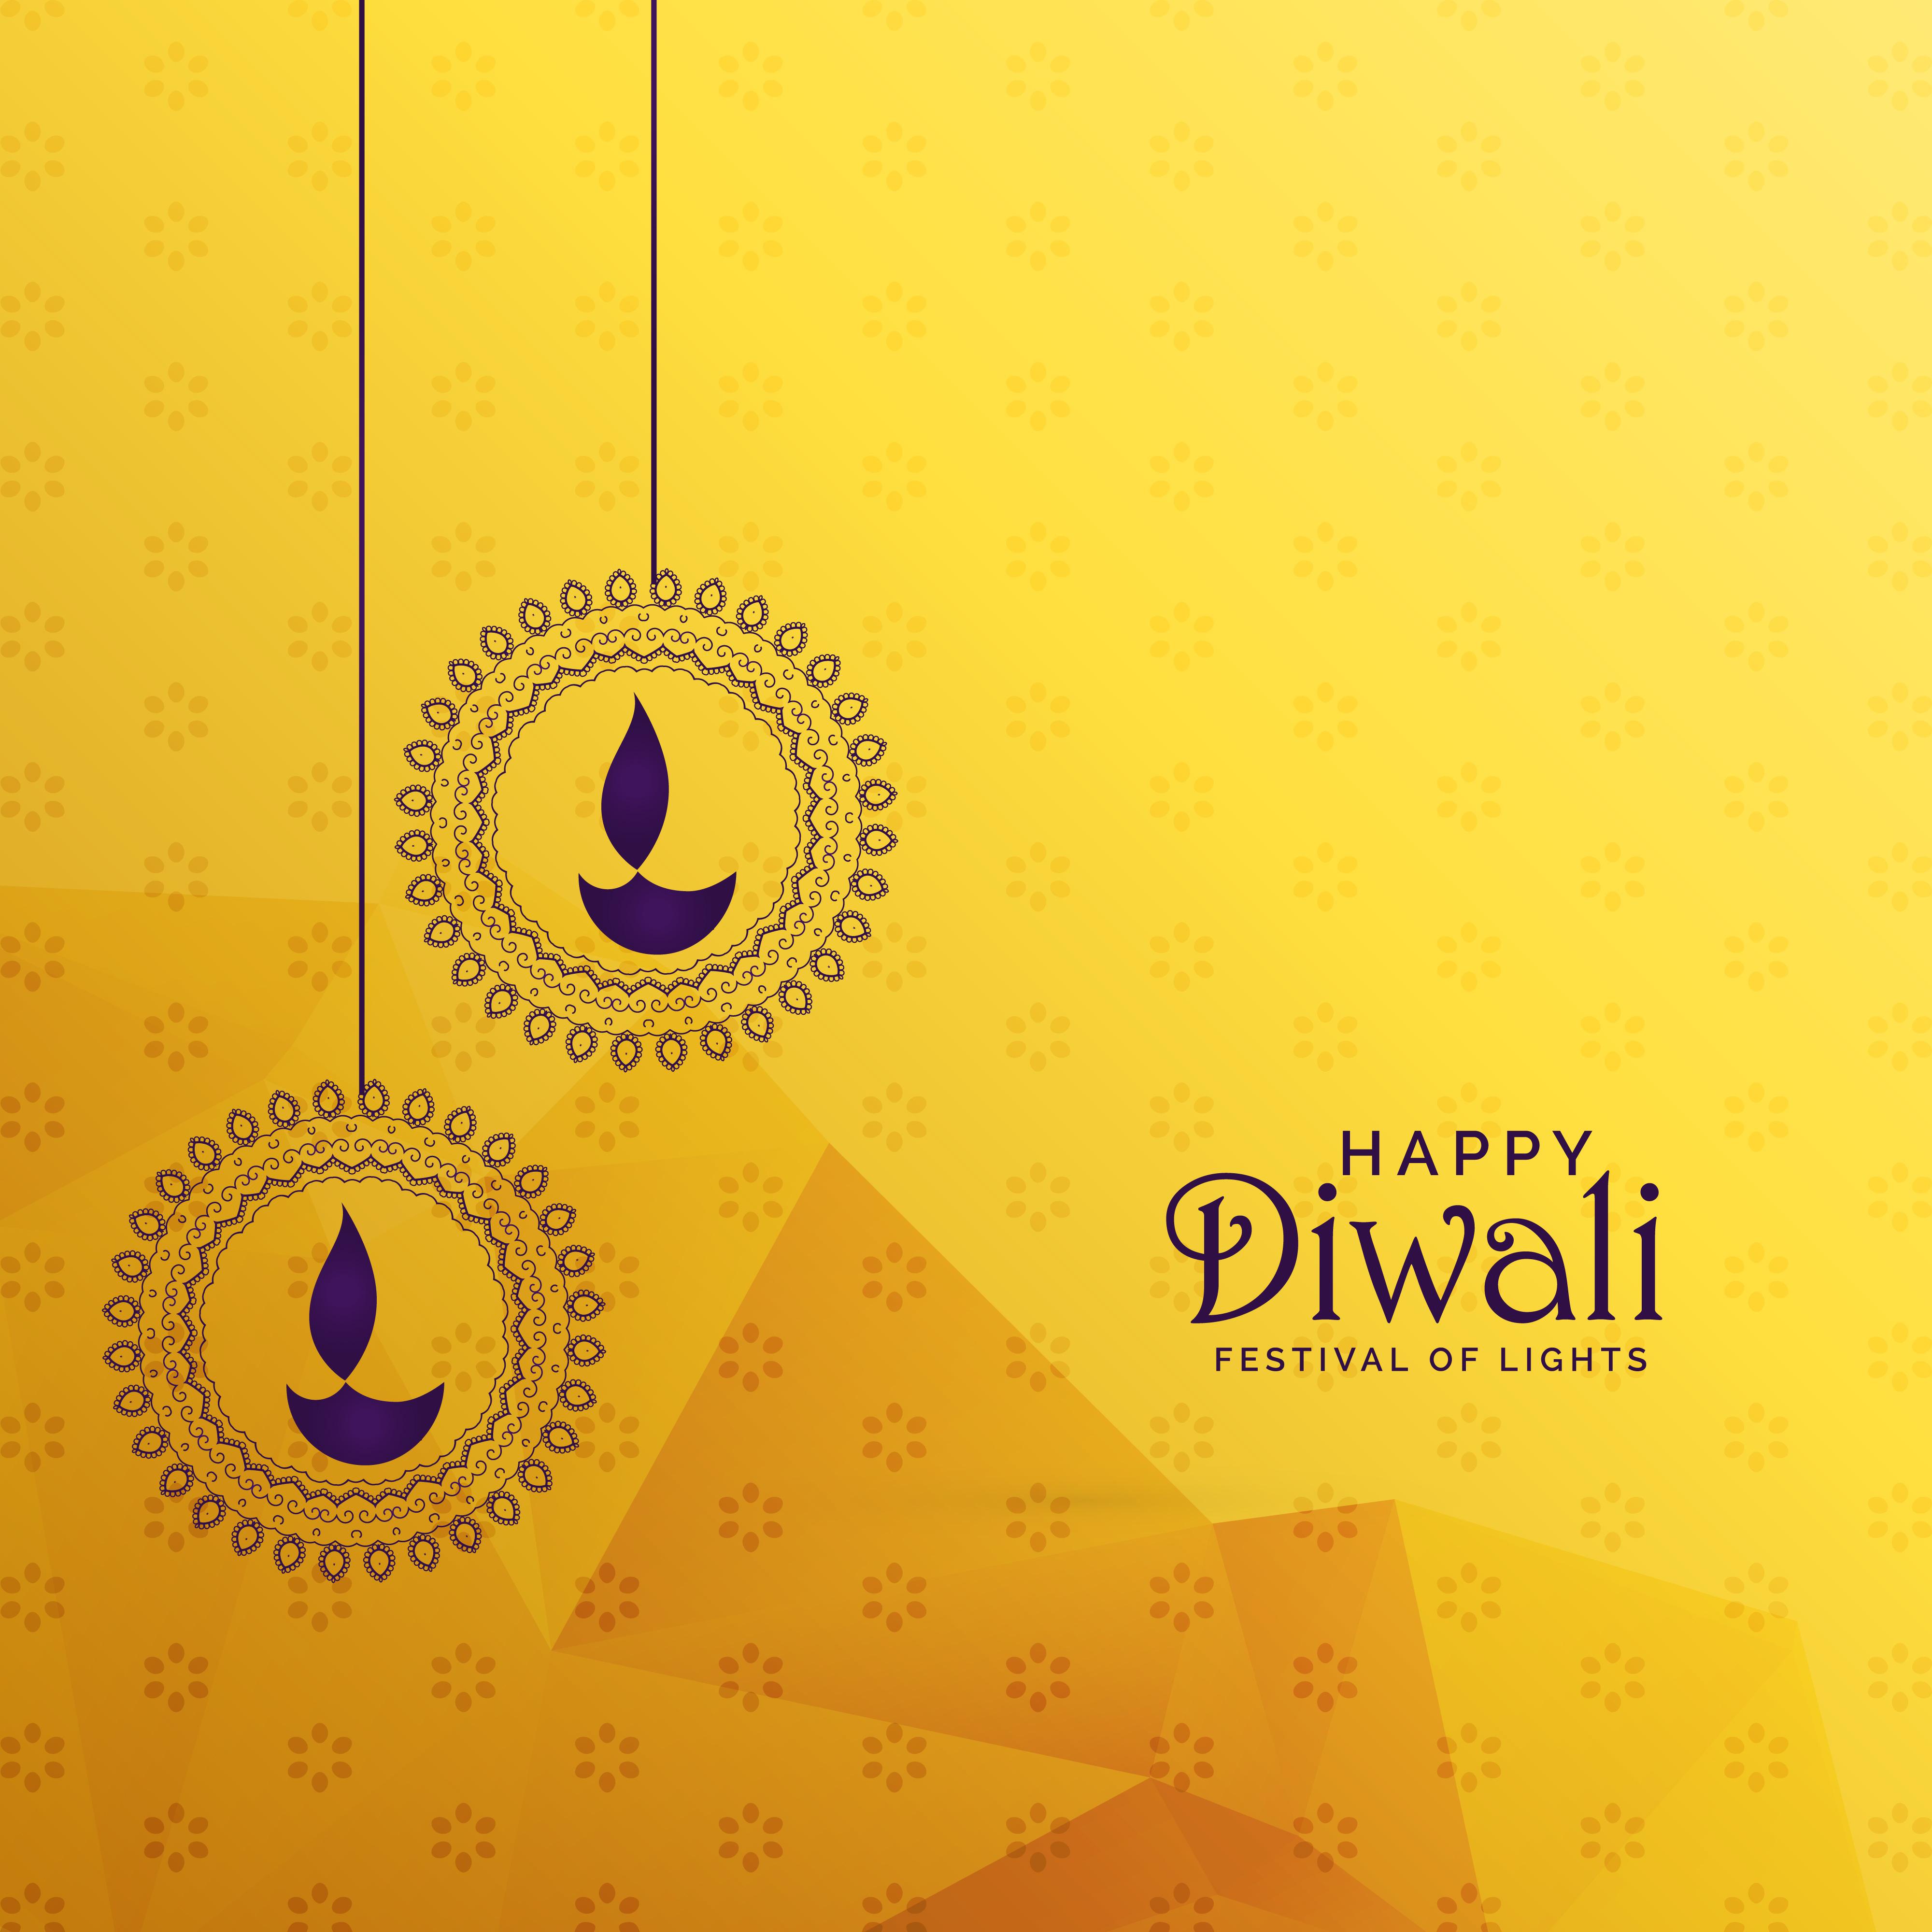 Premium Diwali Greeting Card Design With Diya Decoration Download